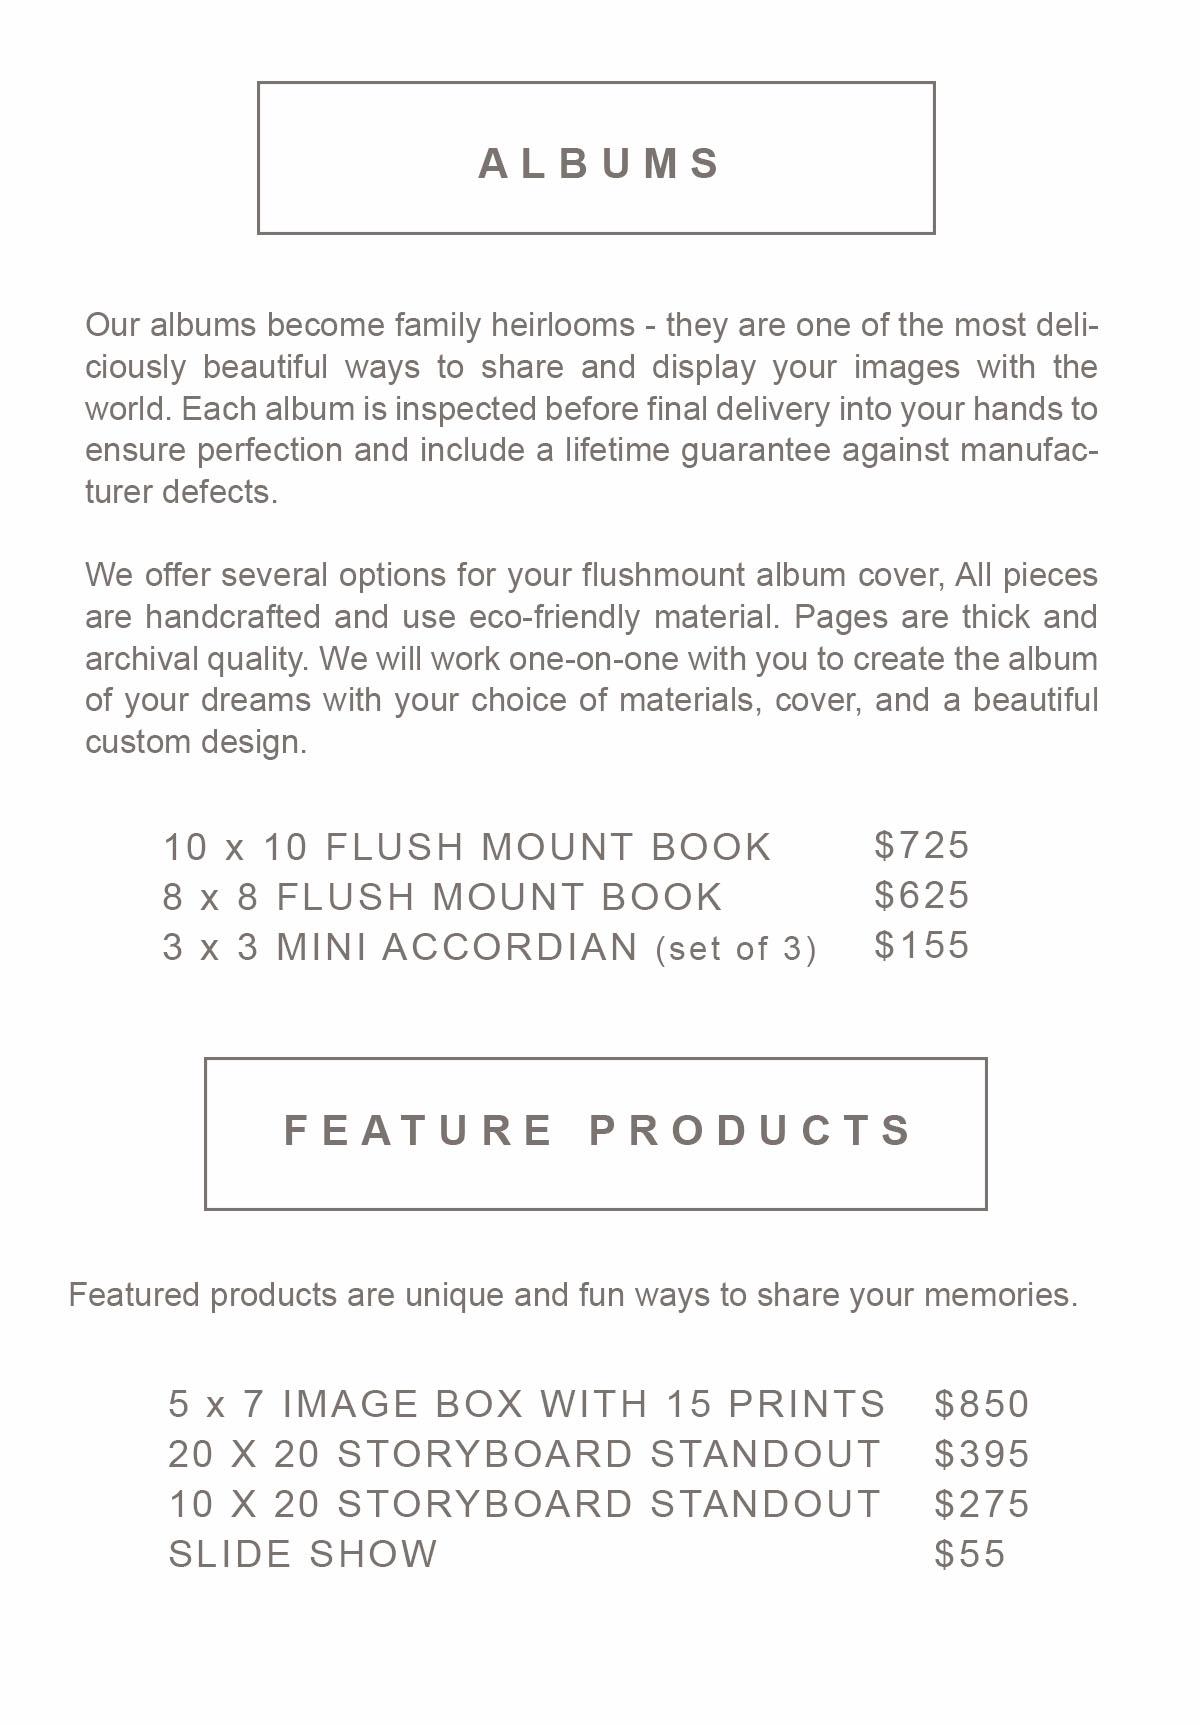 Pricing for senior photos